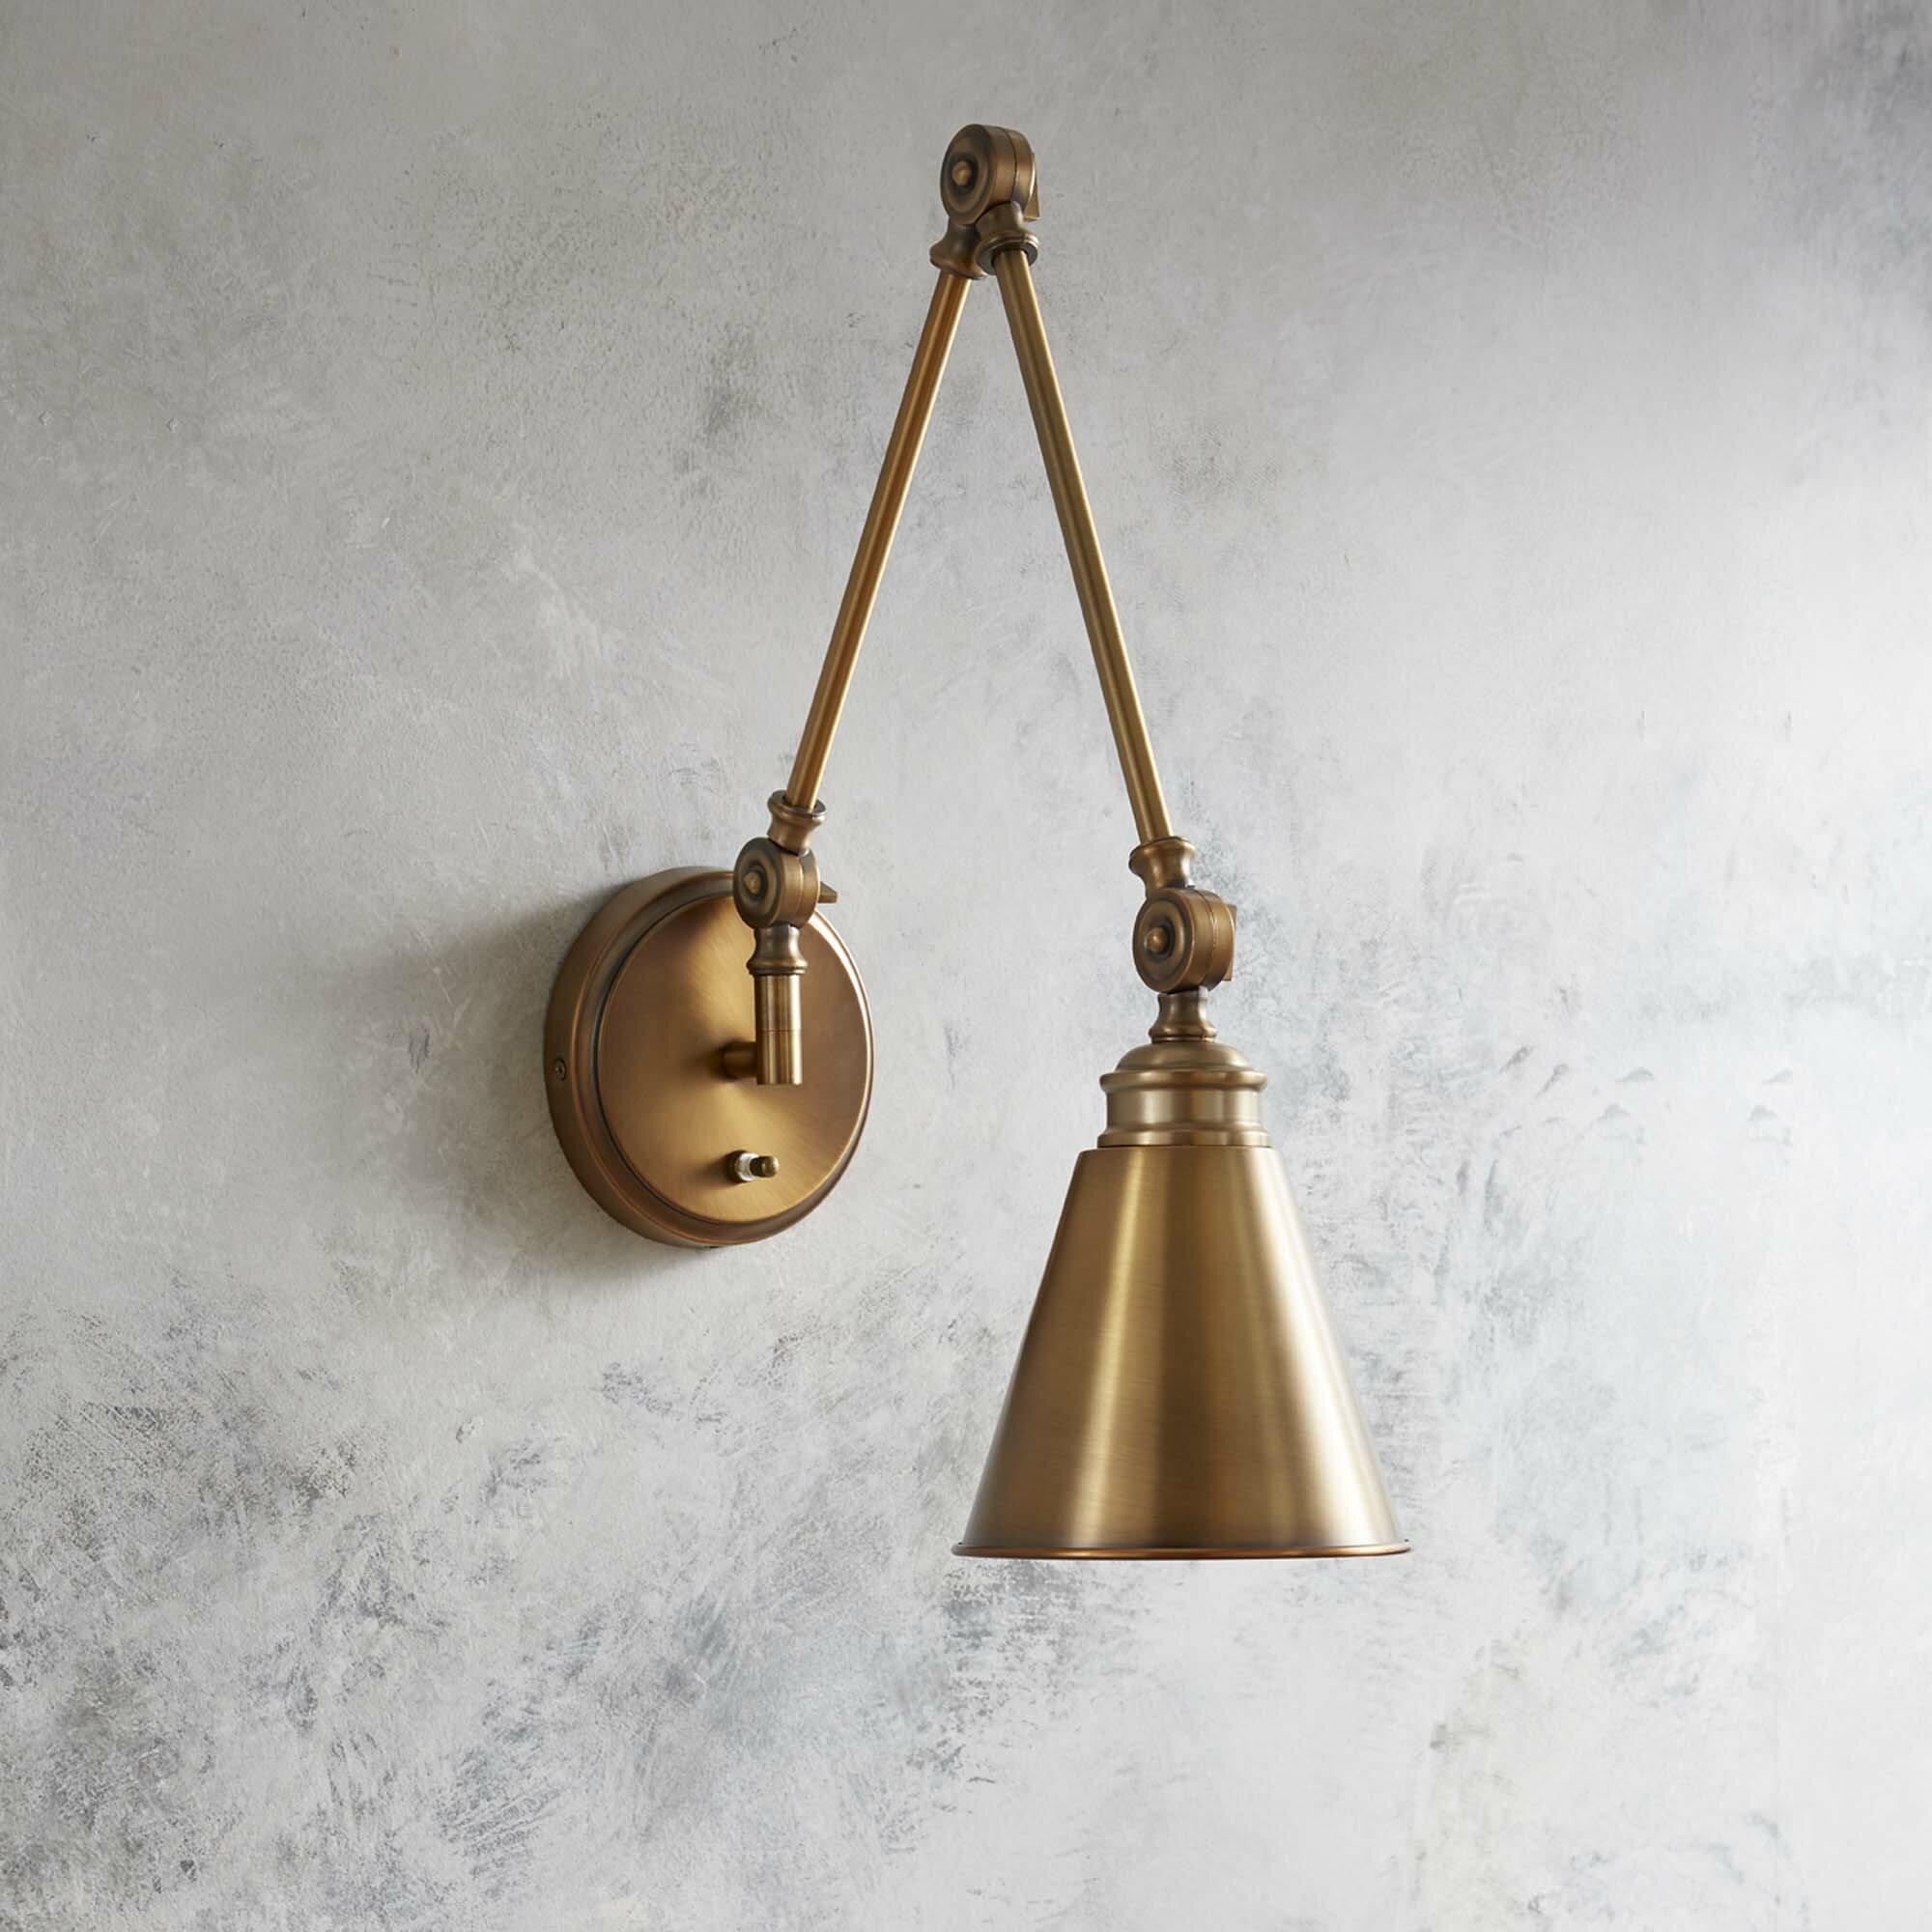 Waucoba 1 light swing arm lamp